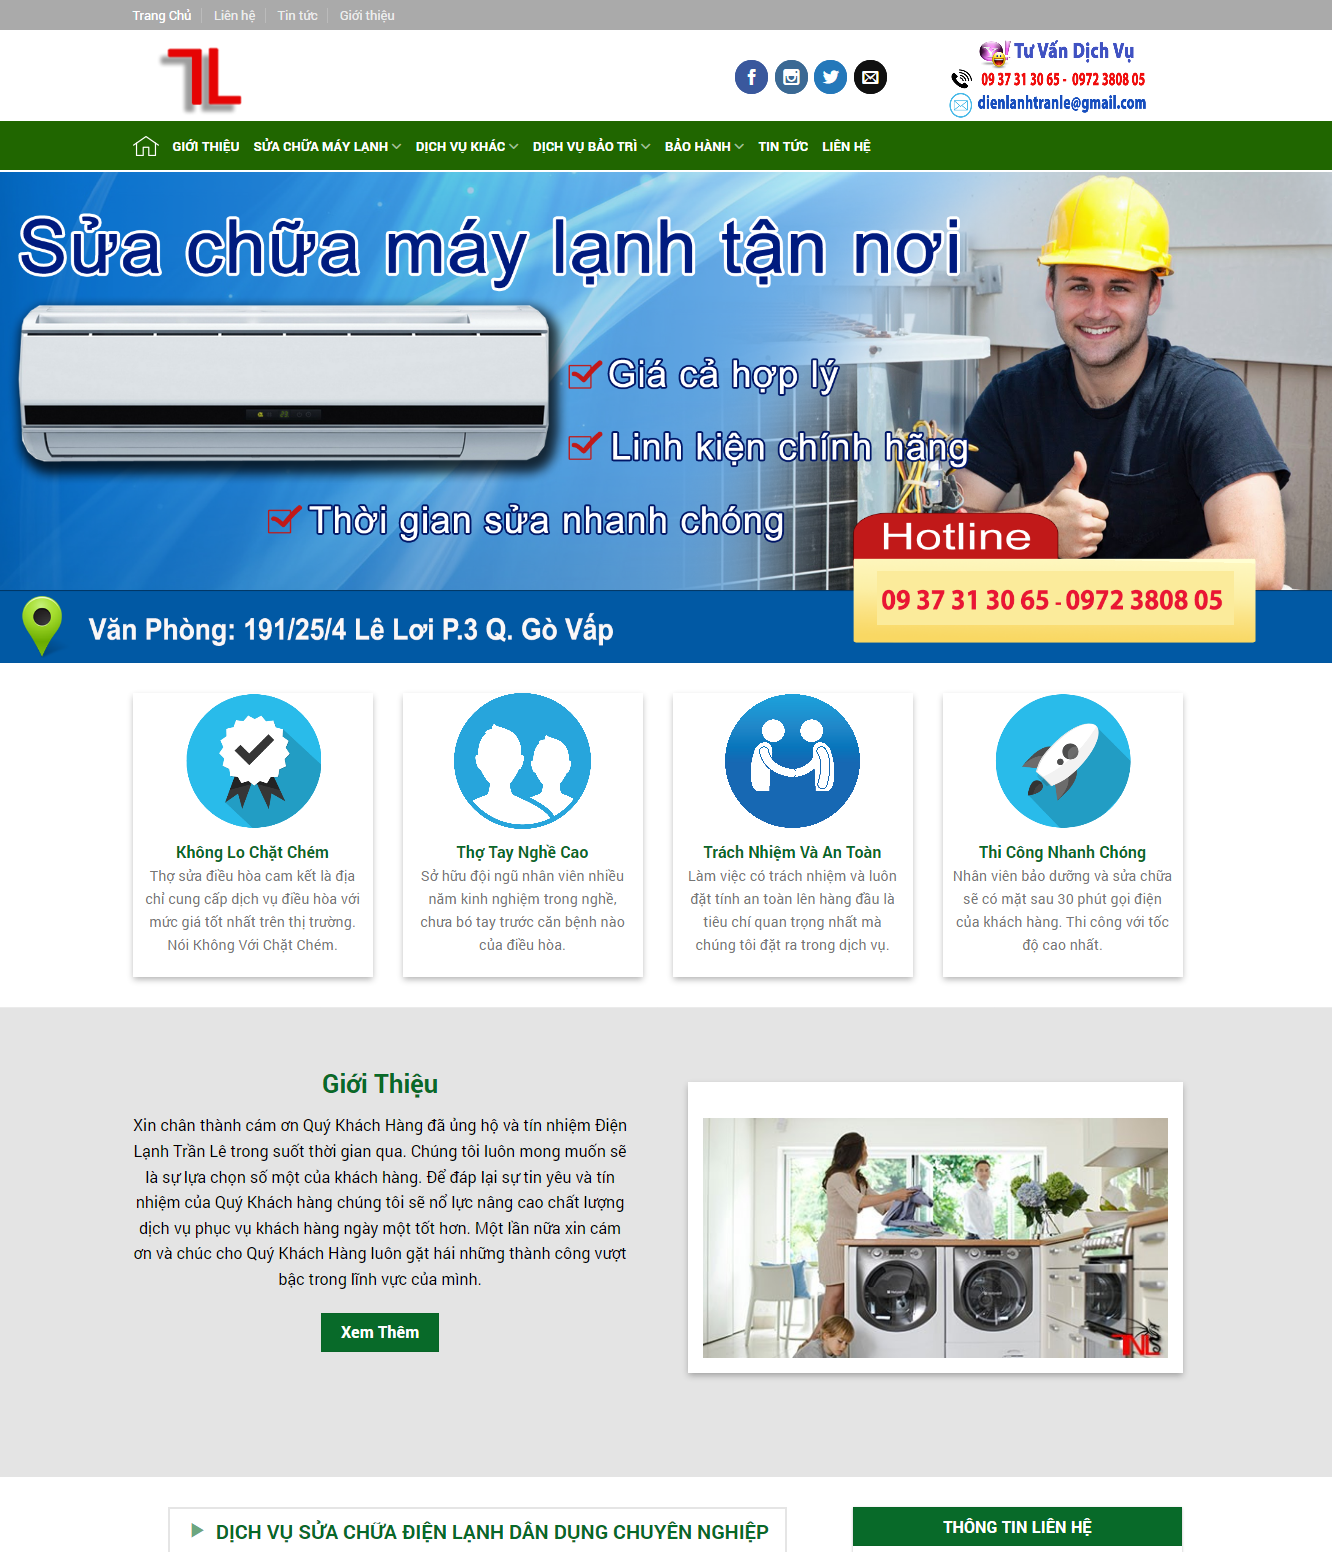 screenshot suachuadienlanhhcm.com .vn 2017 11 16 15 56 00 - Thiết Kế Website